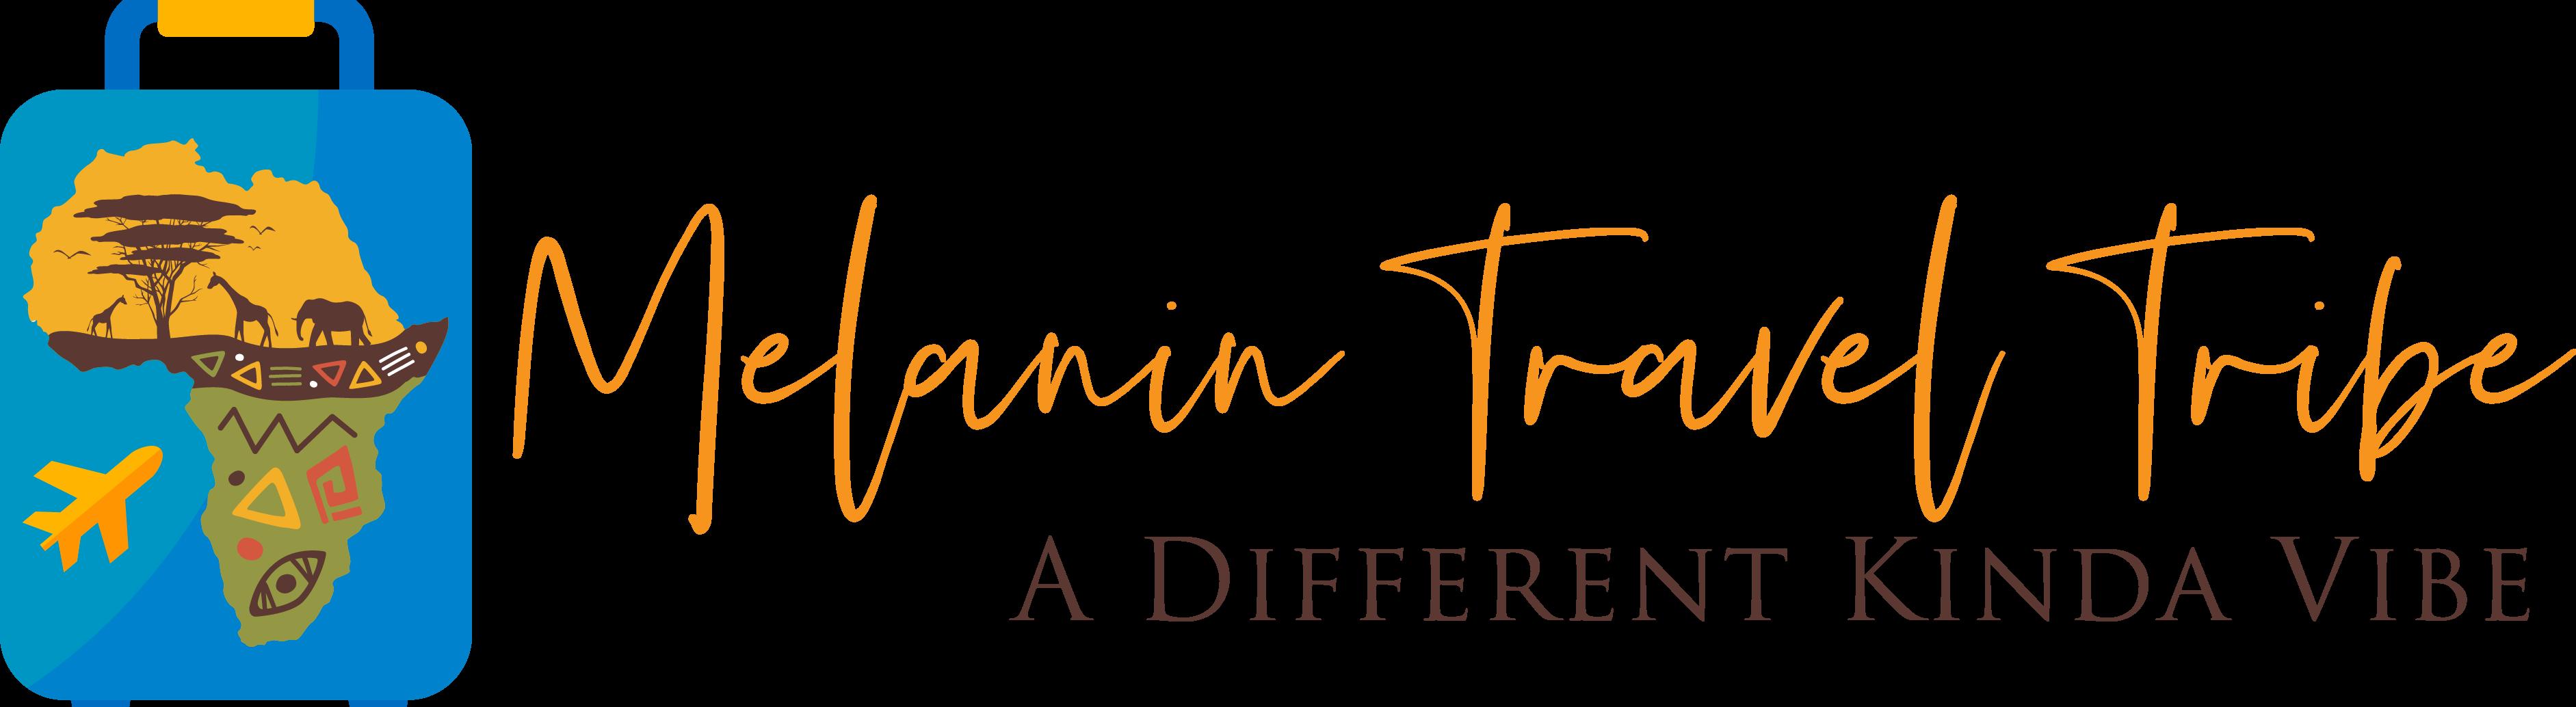 Melanin Travel Tribe | Curated Elite Travel Experiences for the Discerning Traveler